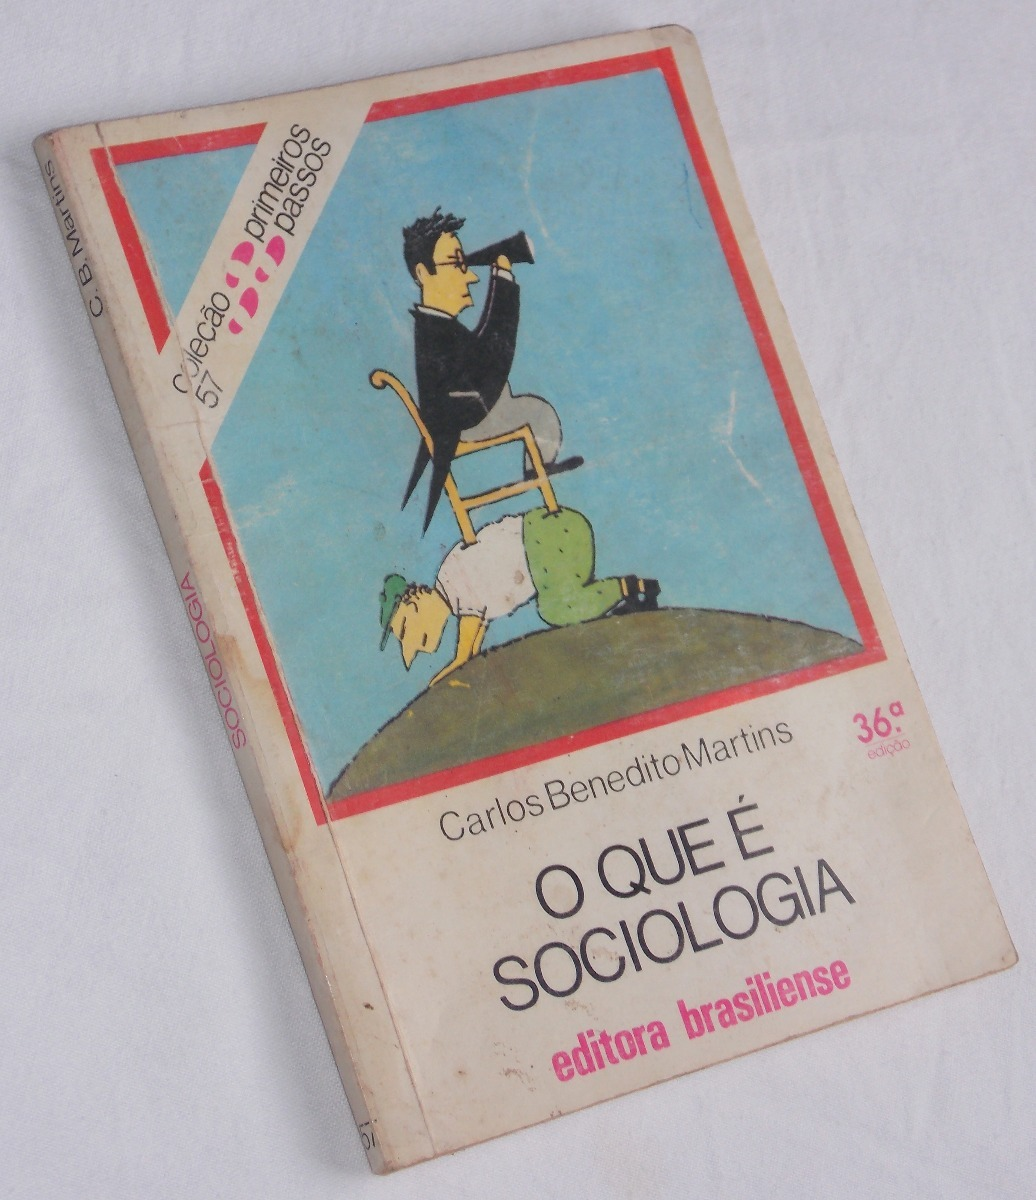 O Que E Sociologia Carlos Benedito Martins Pdf